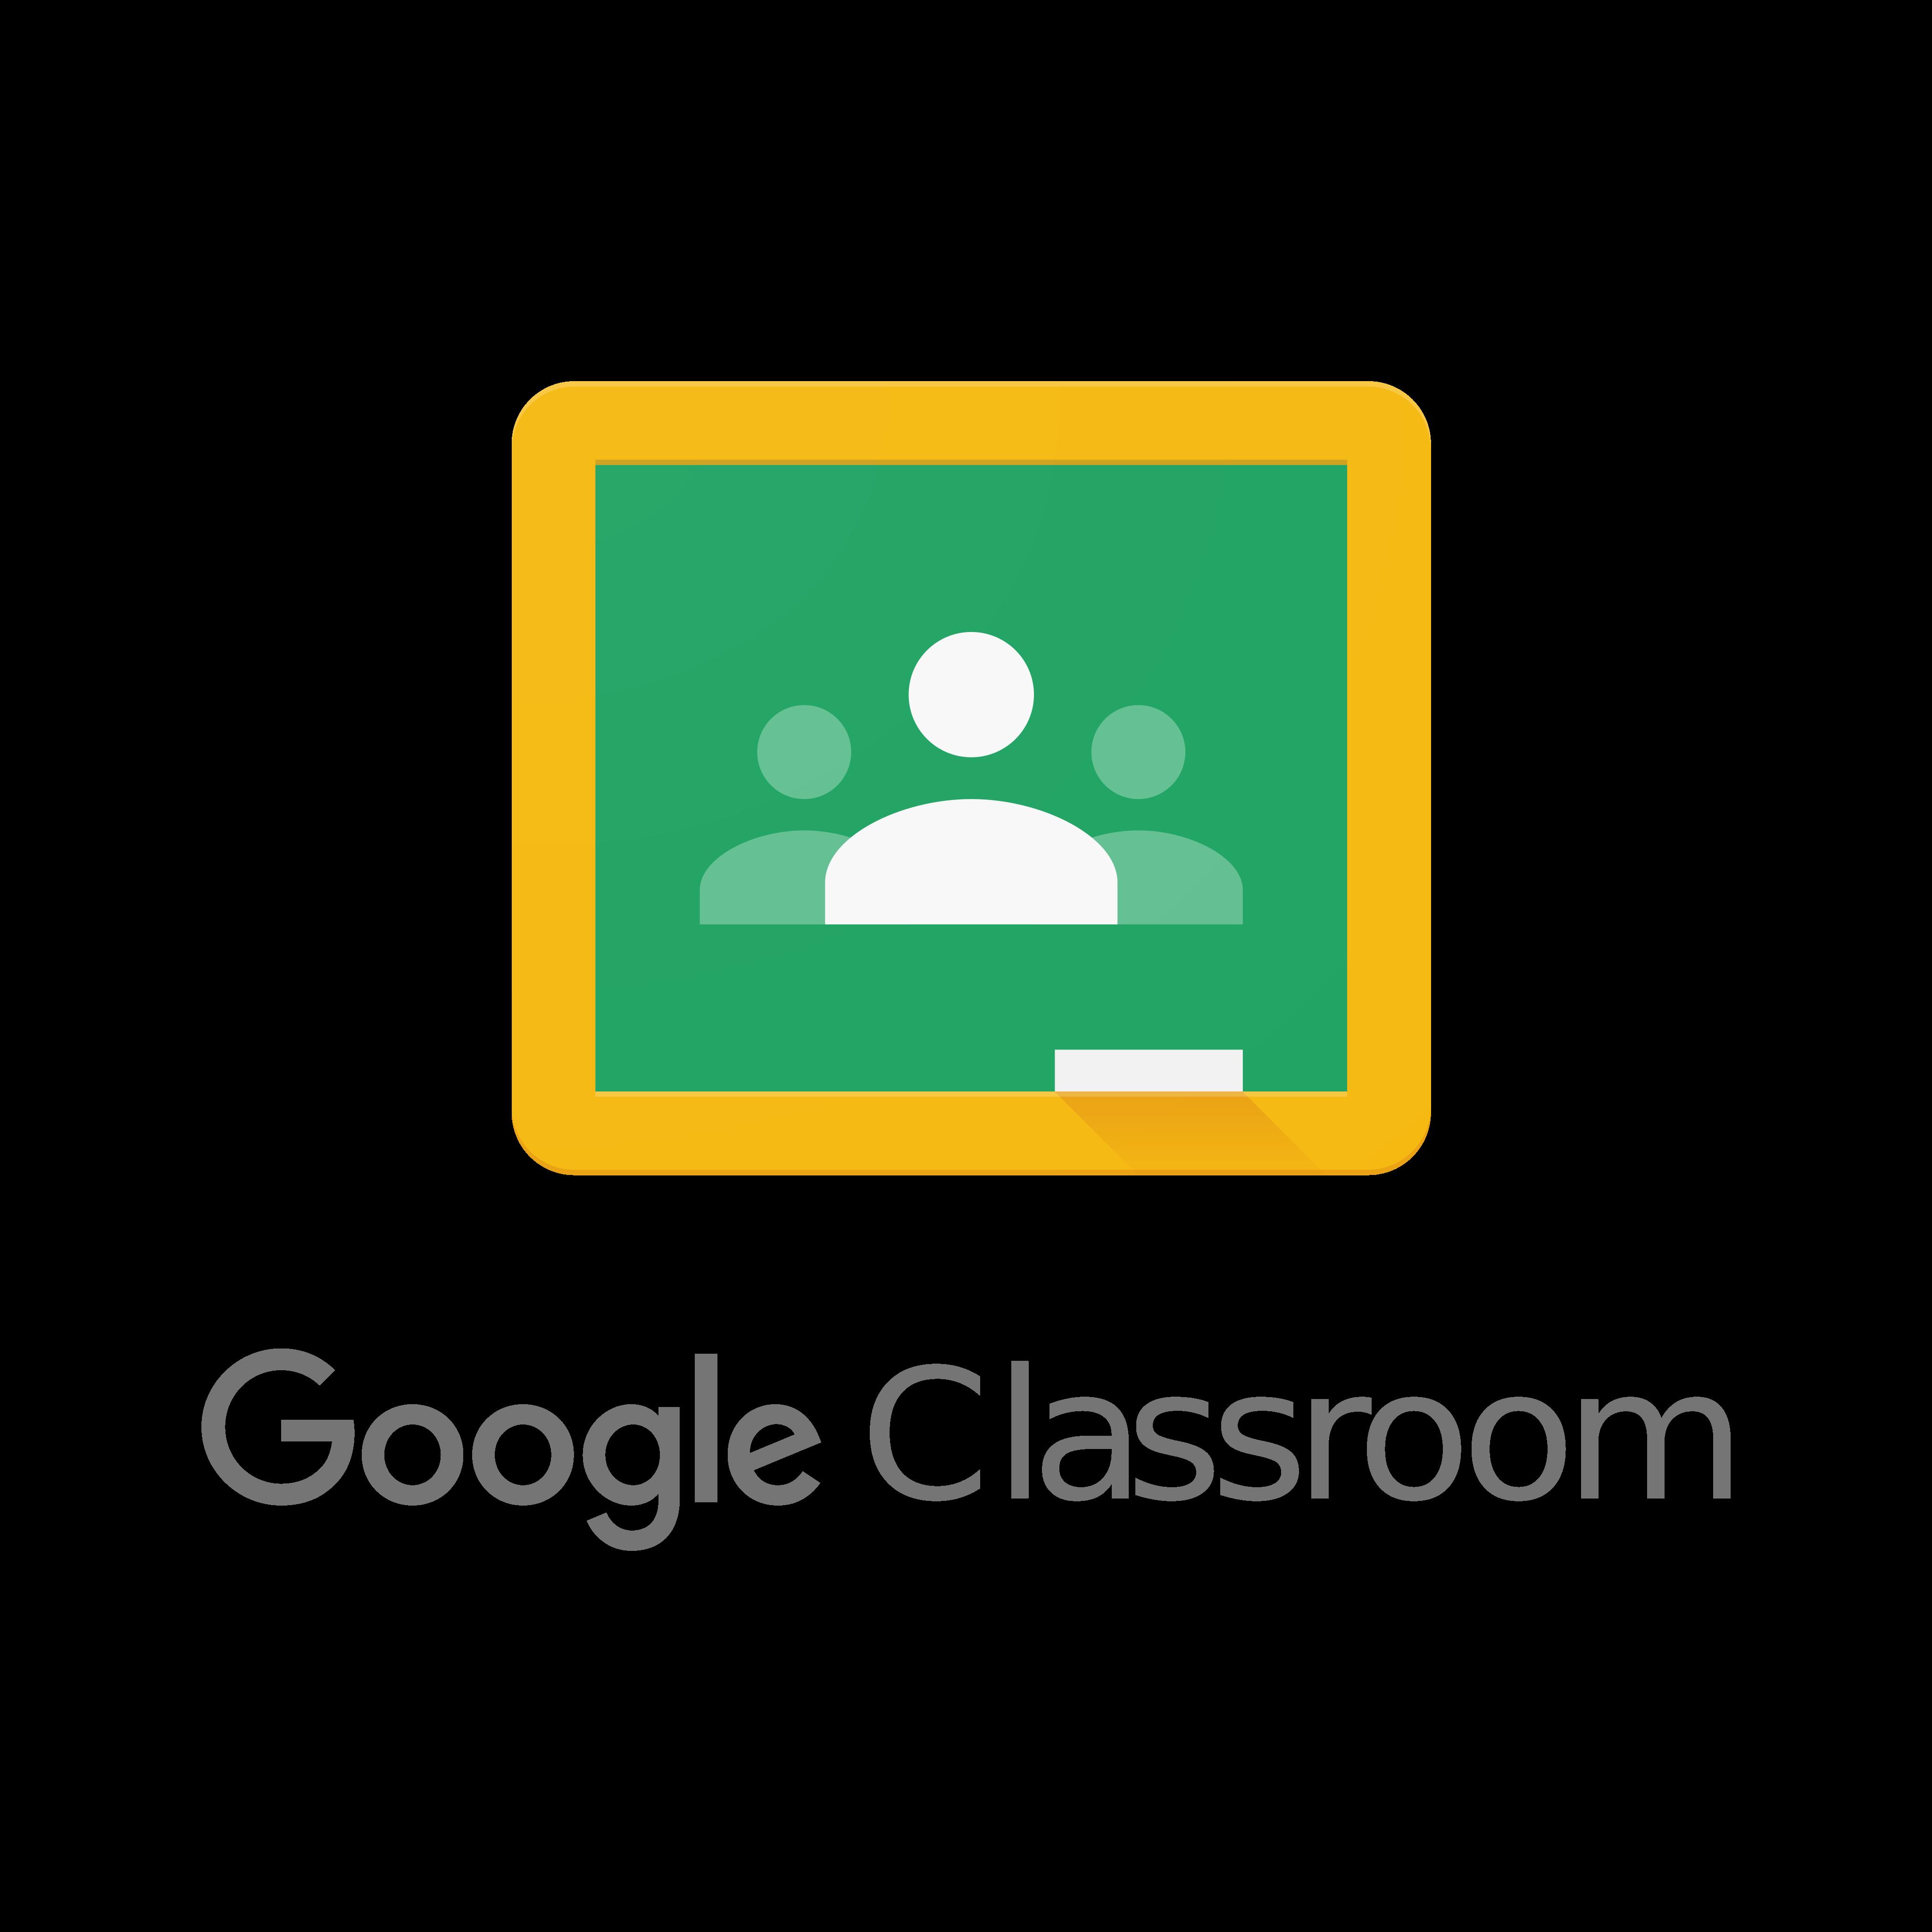 google classroom logo 0 - Google Classroom Logo